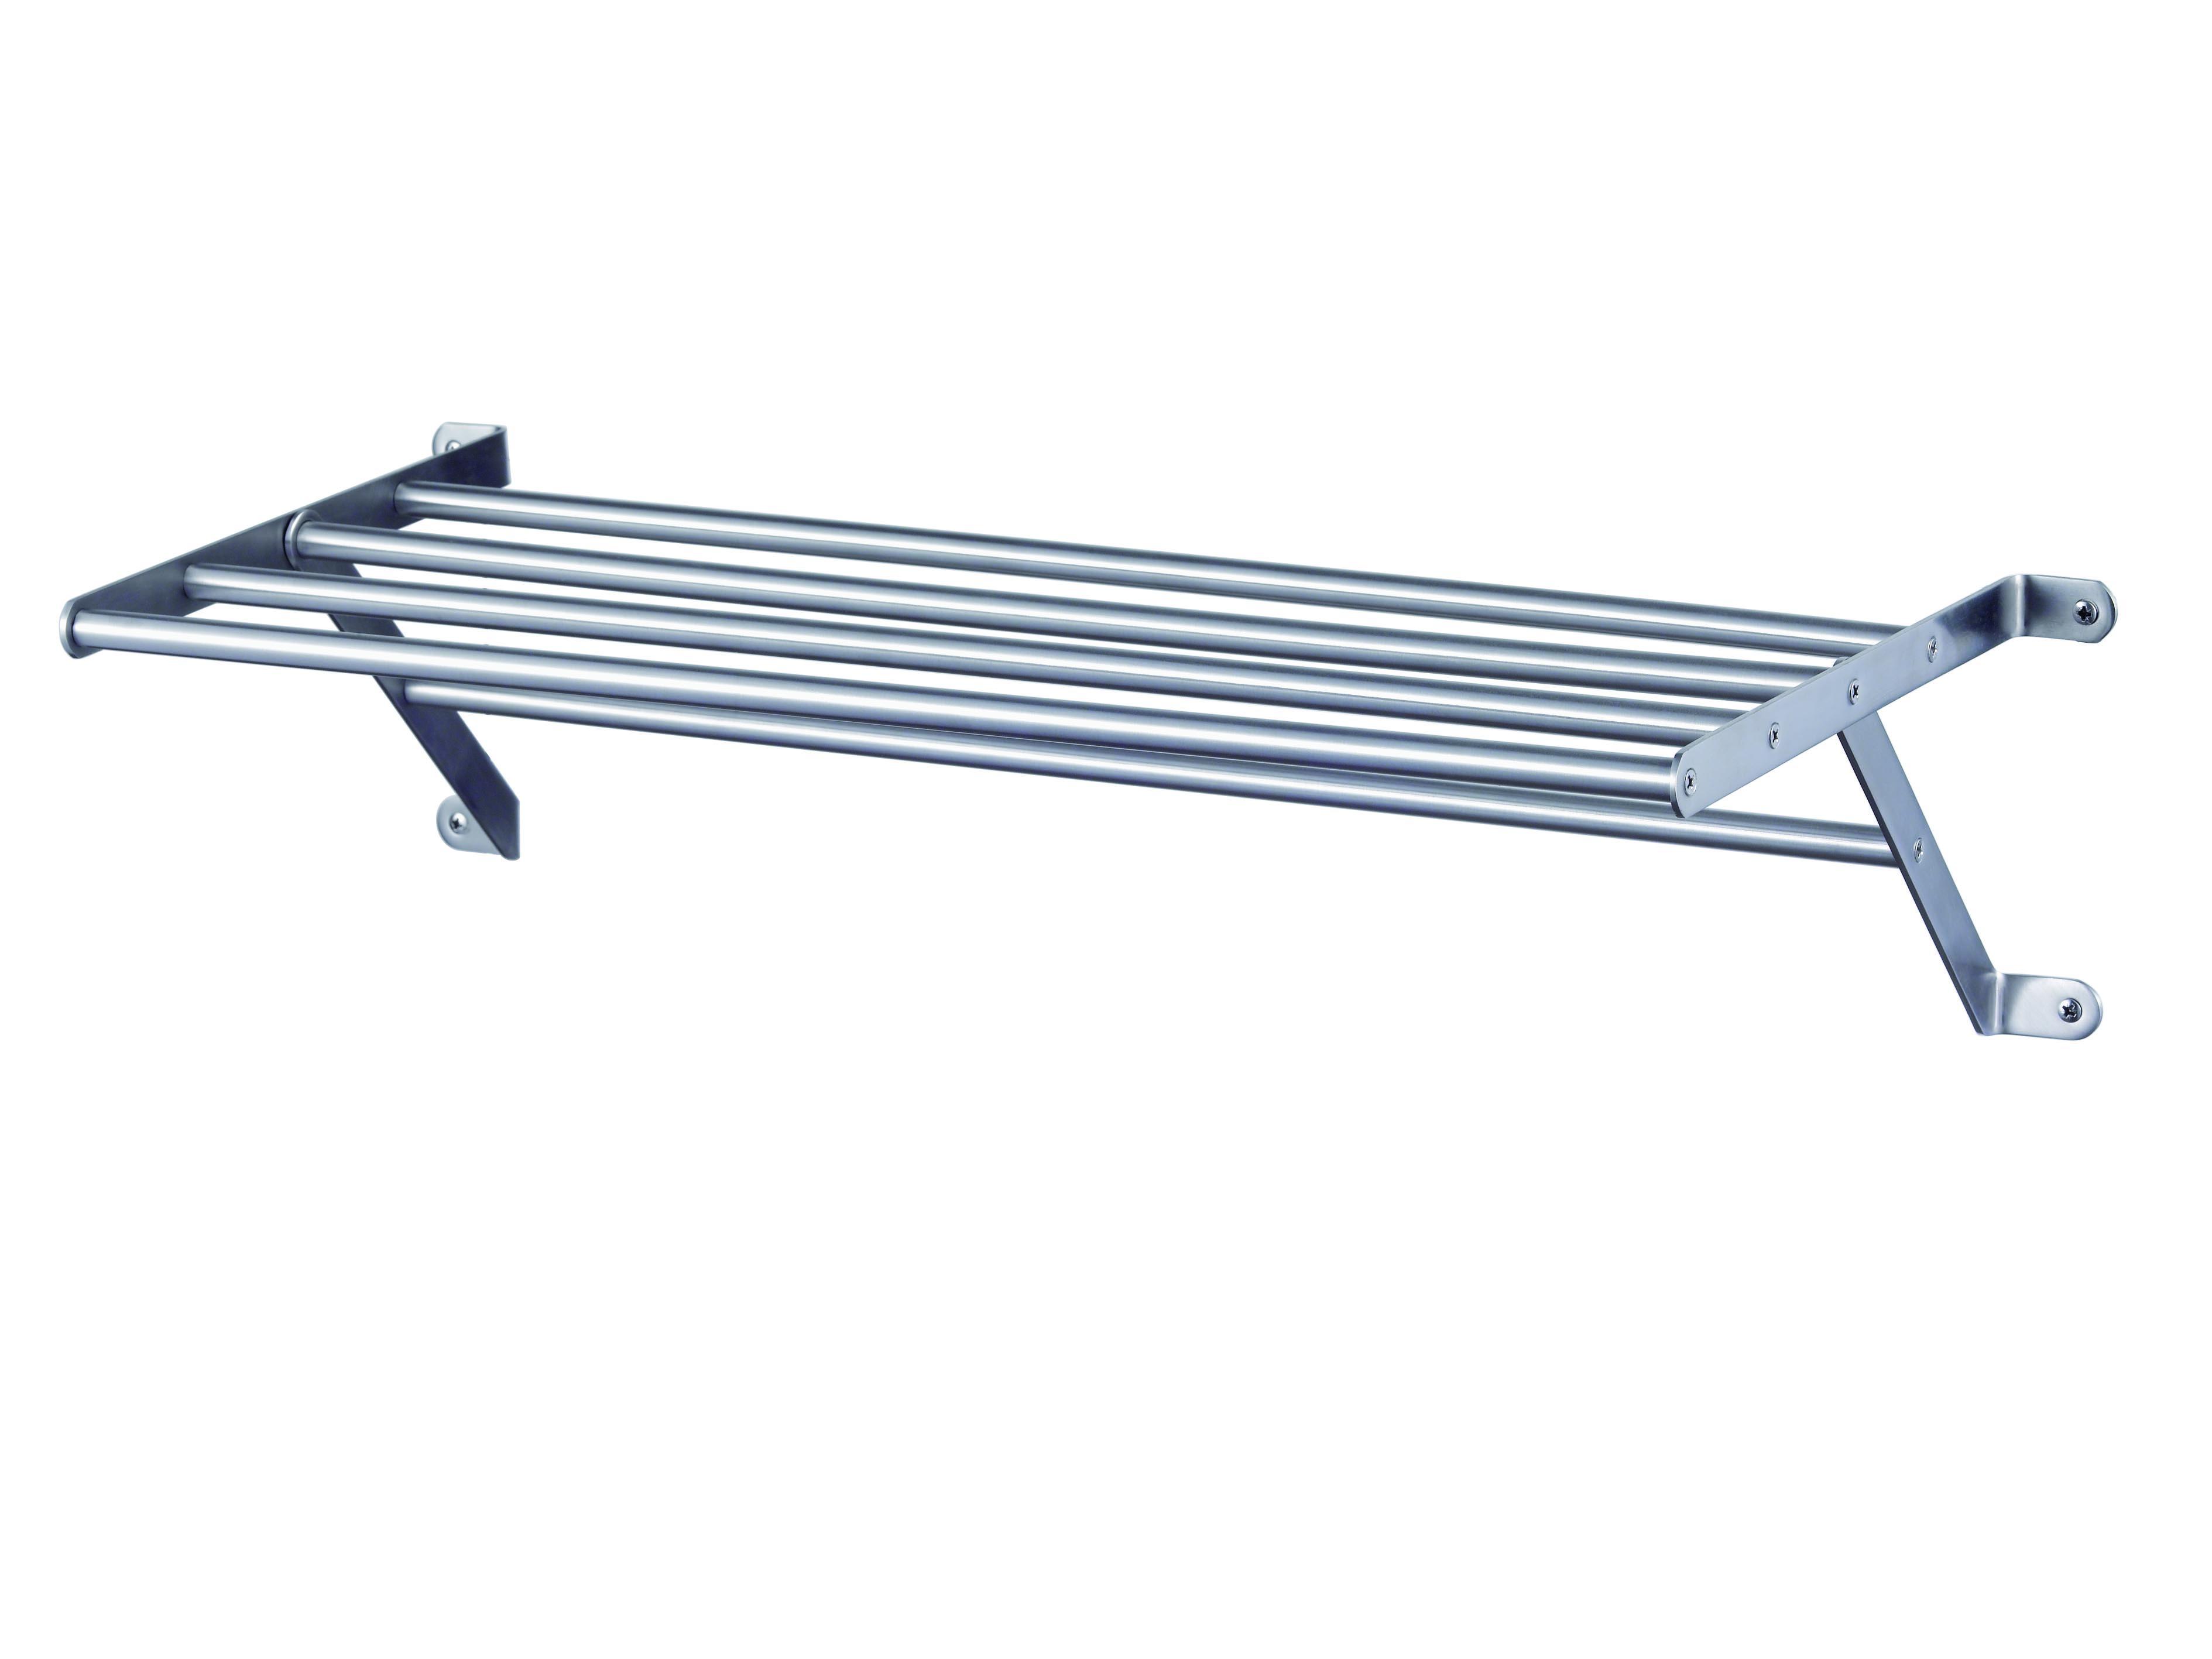 Haceka IXI RVS Towel Rack with bar